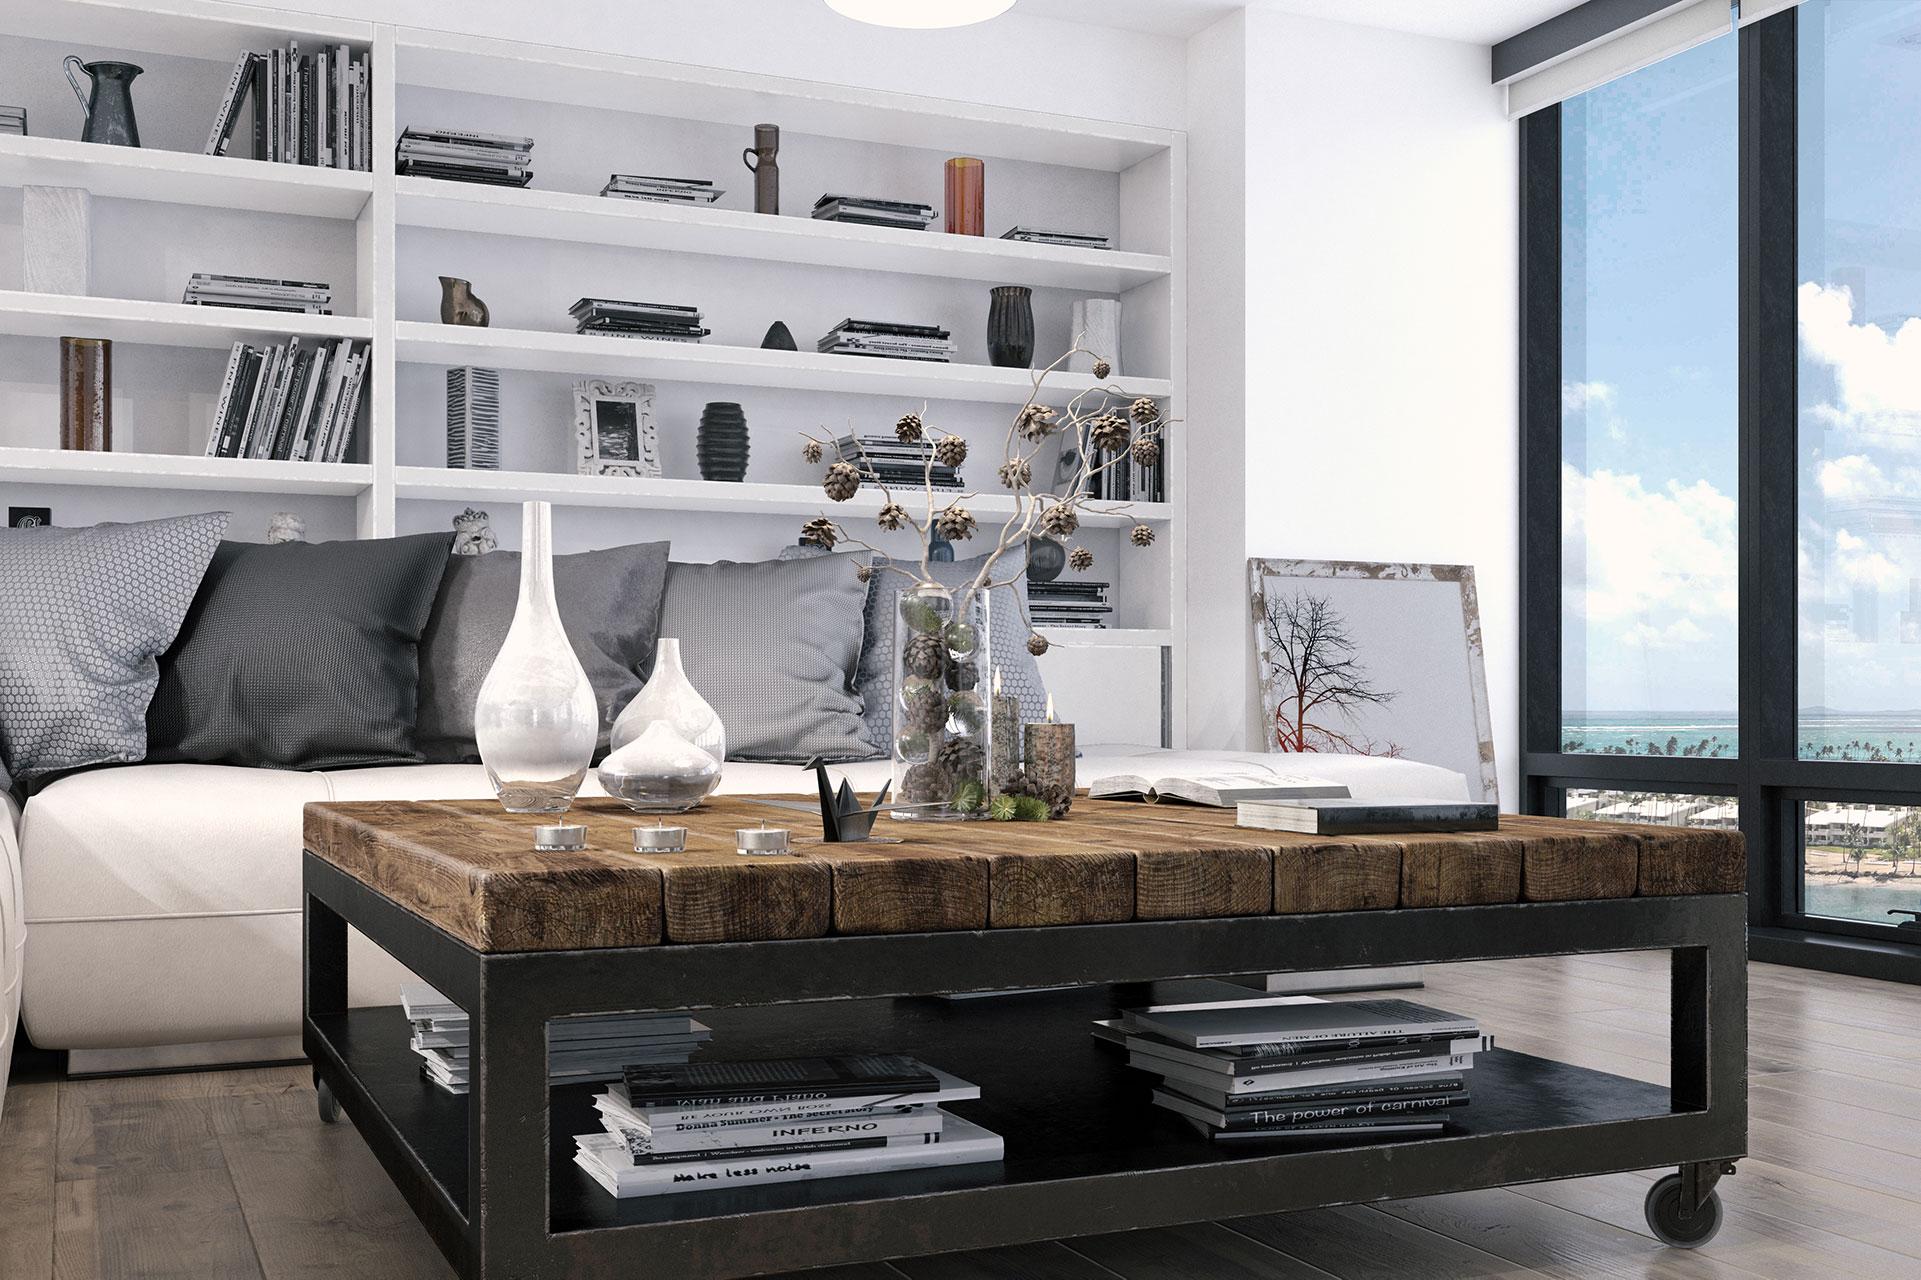 Focused Interior render of an apartment